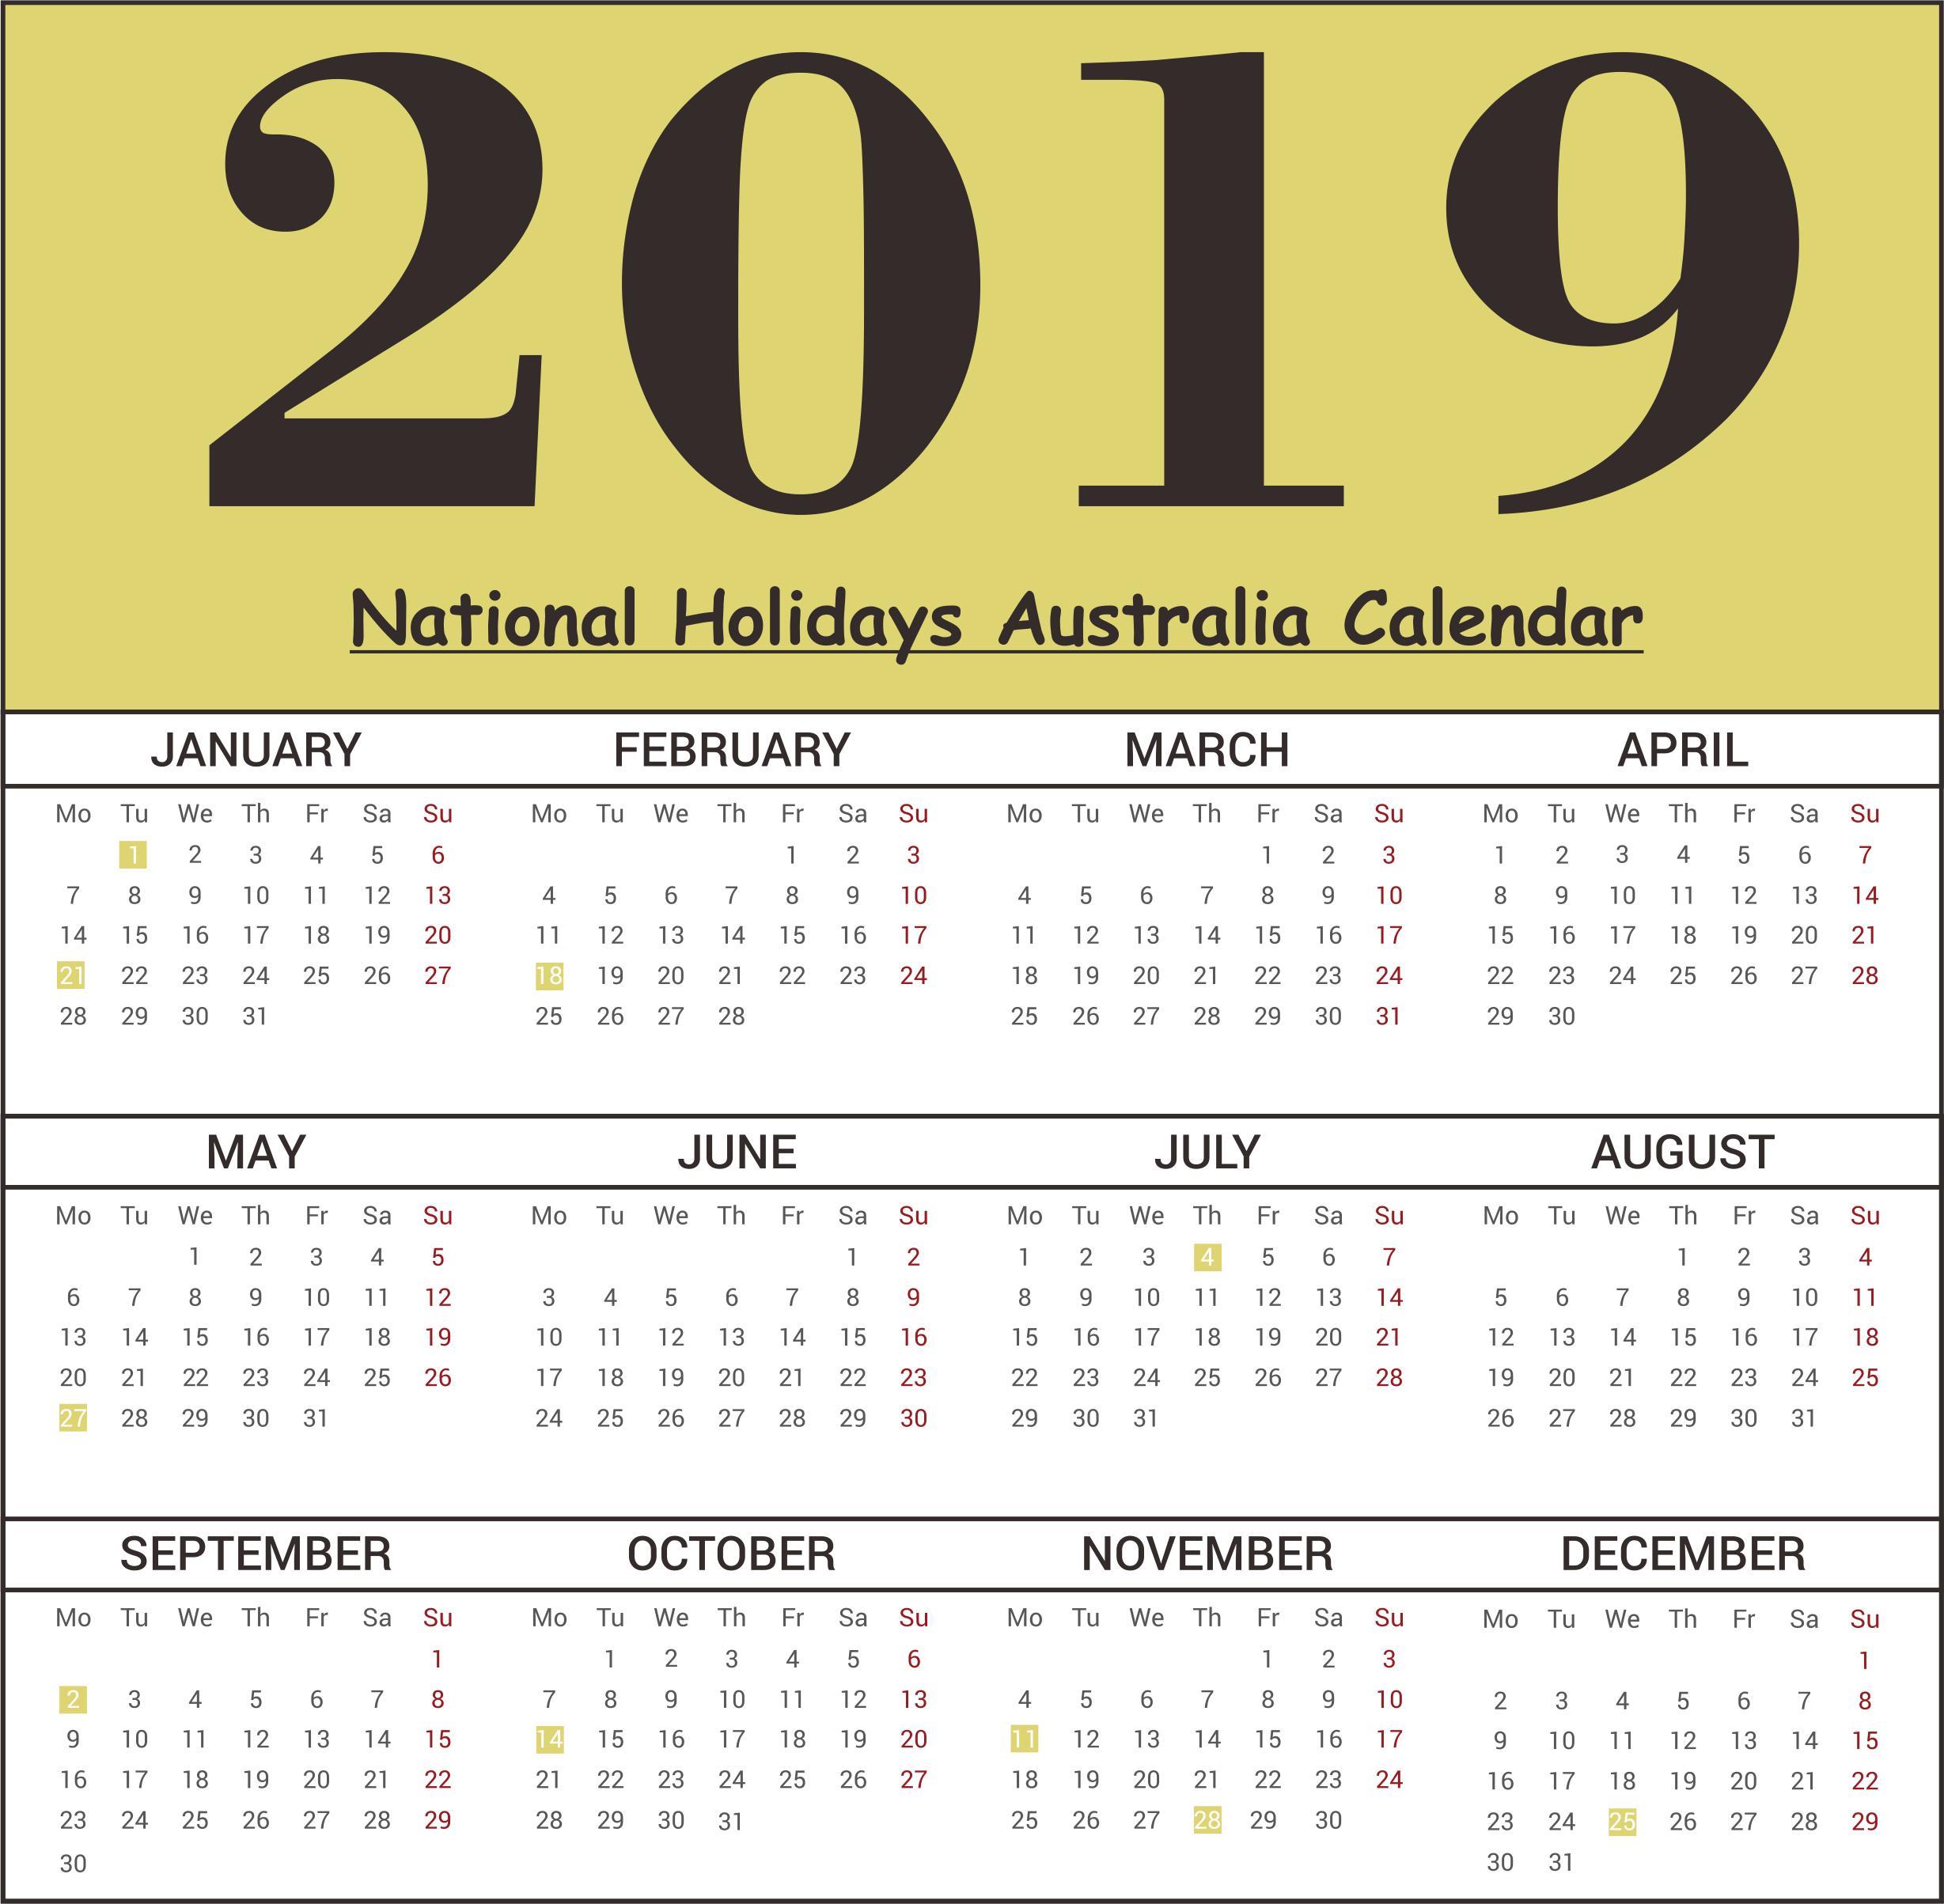 Australia National Holidays 2019 Templates